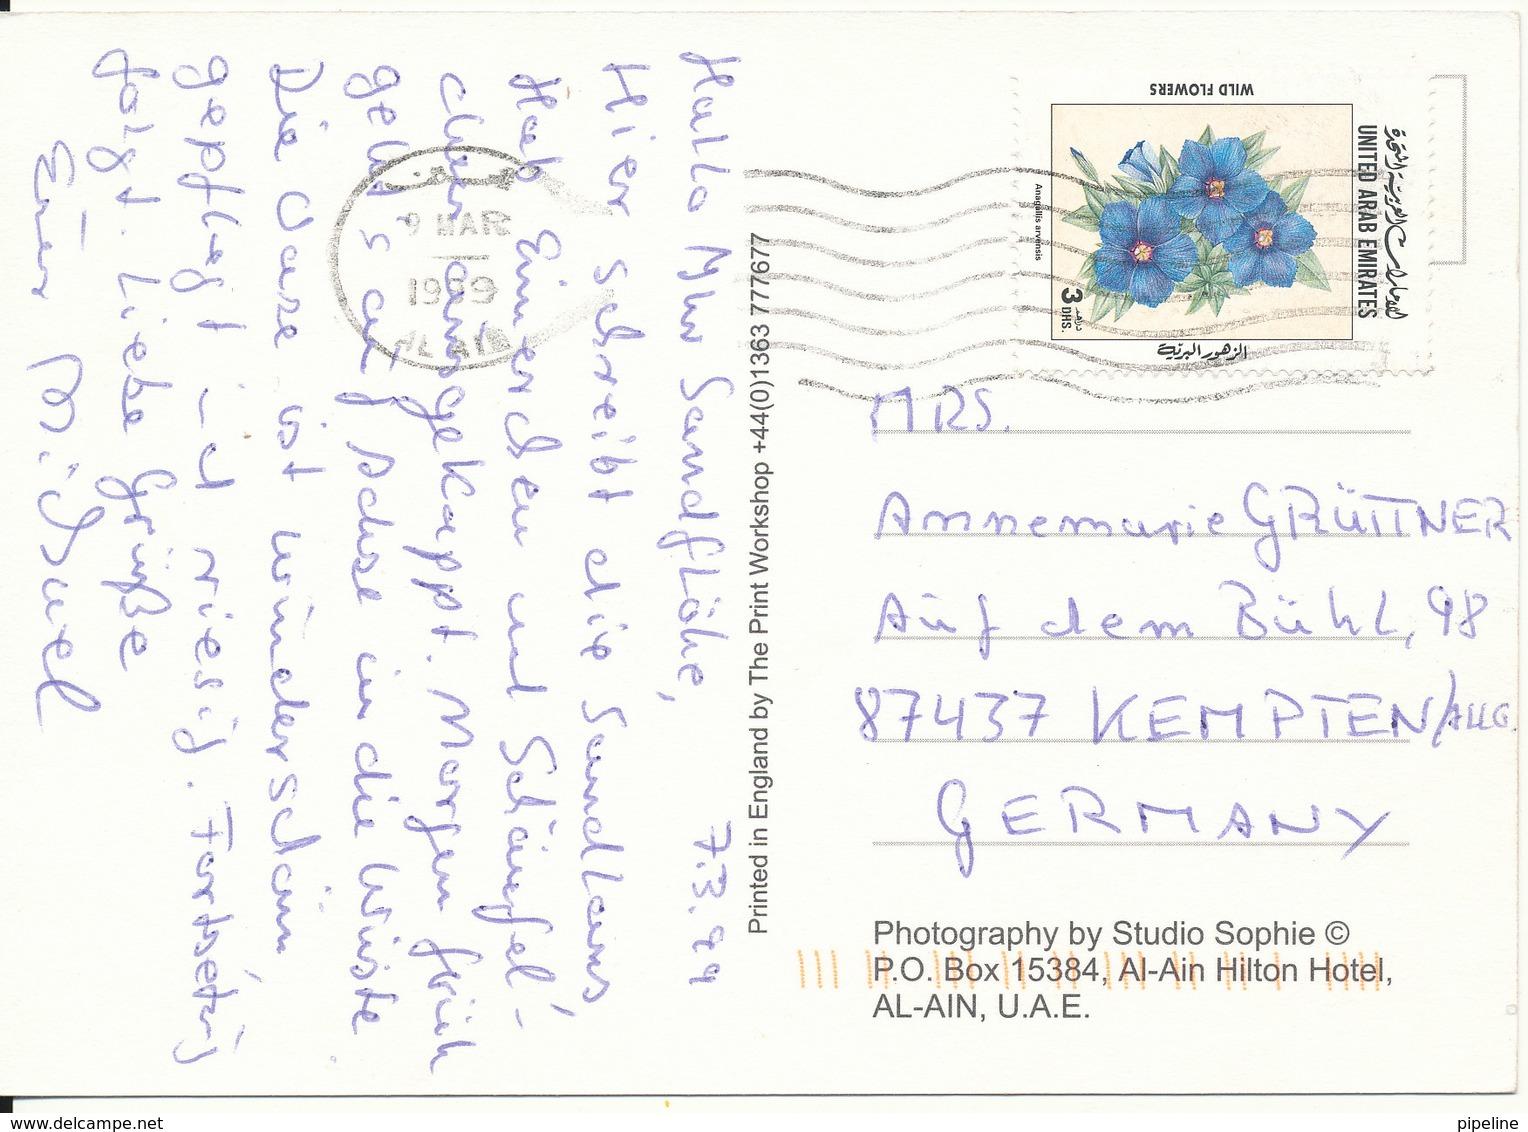 UAE Al-Ain Postcard Sent To Germany 9-3-1999 (Greetings From Al-Ain) - United Arab Emirates